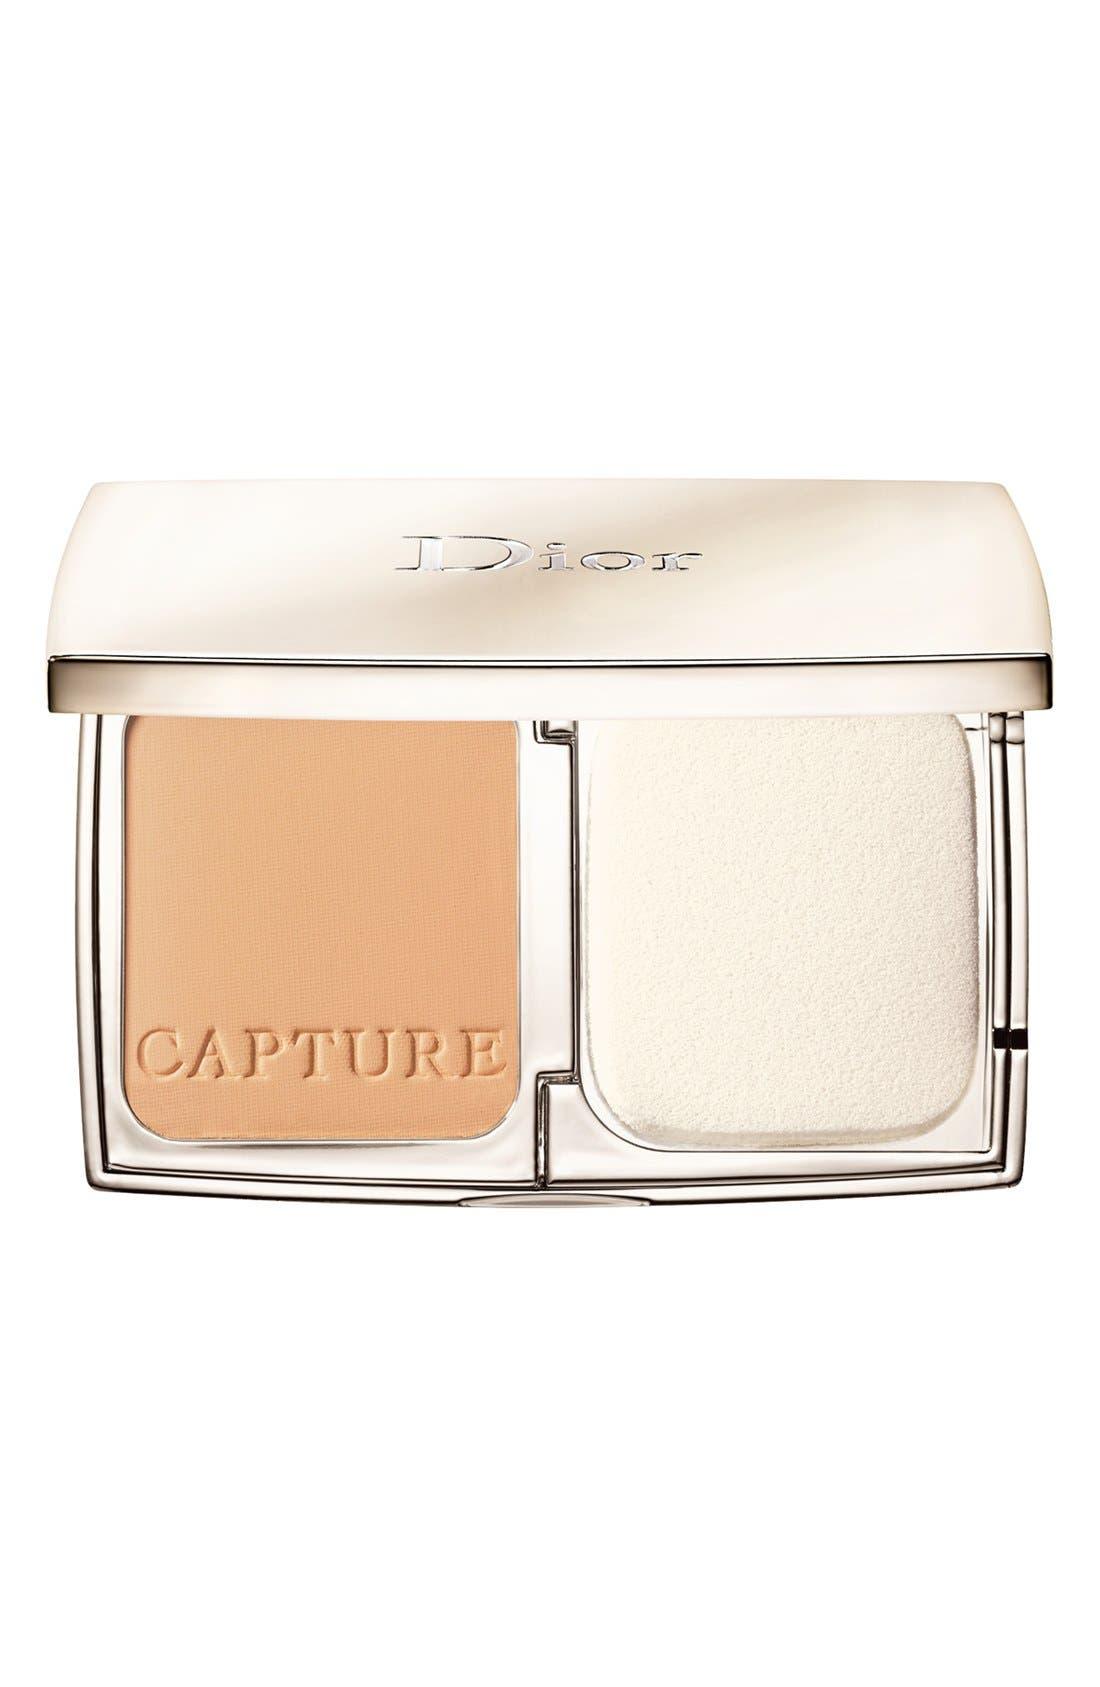 Capture Totale Powder Foundation Compact,                         Main,                         color, 30 MEDIUM BEIGE